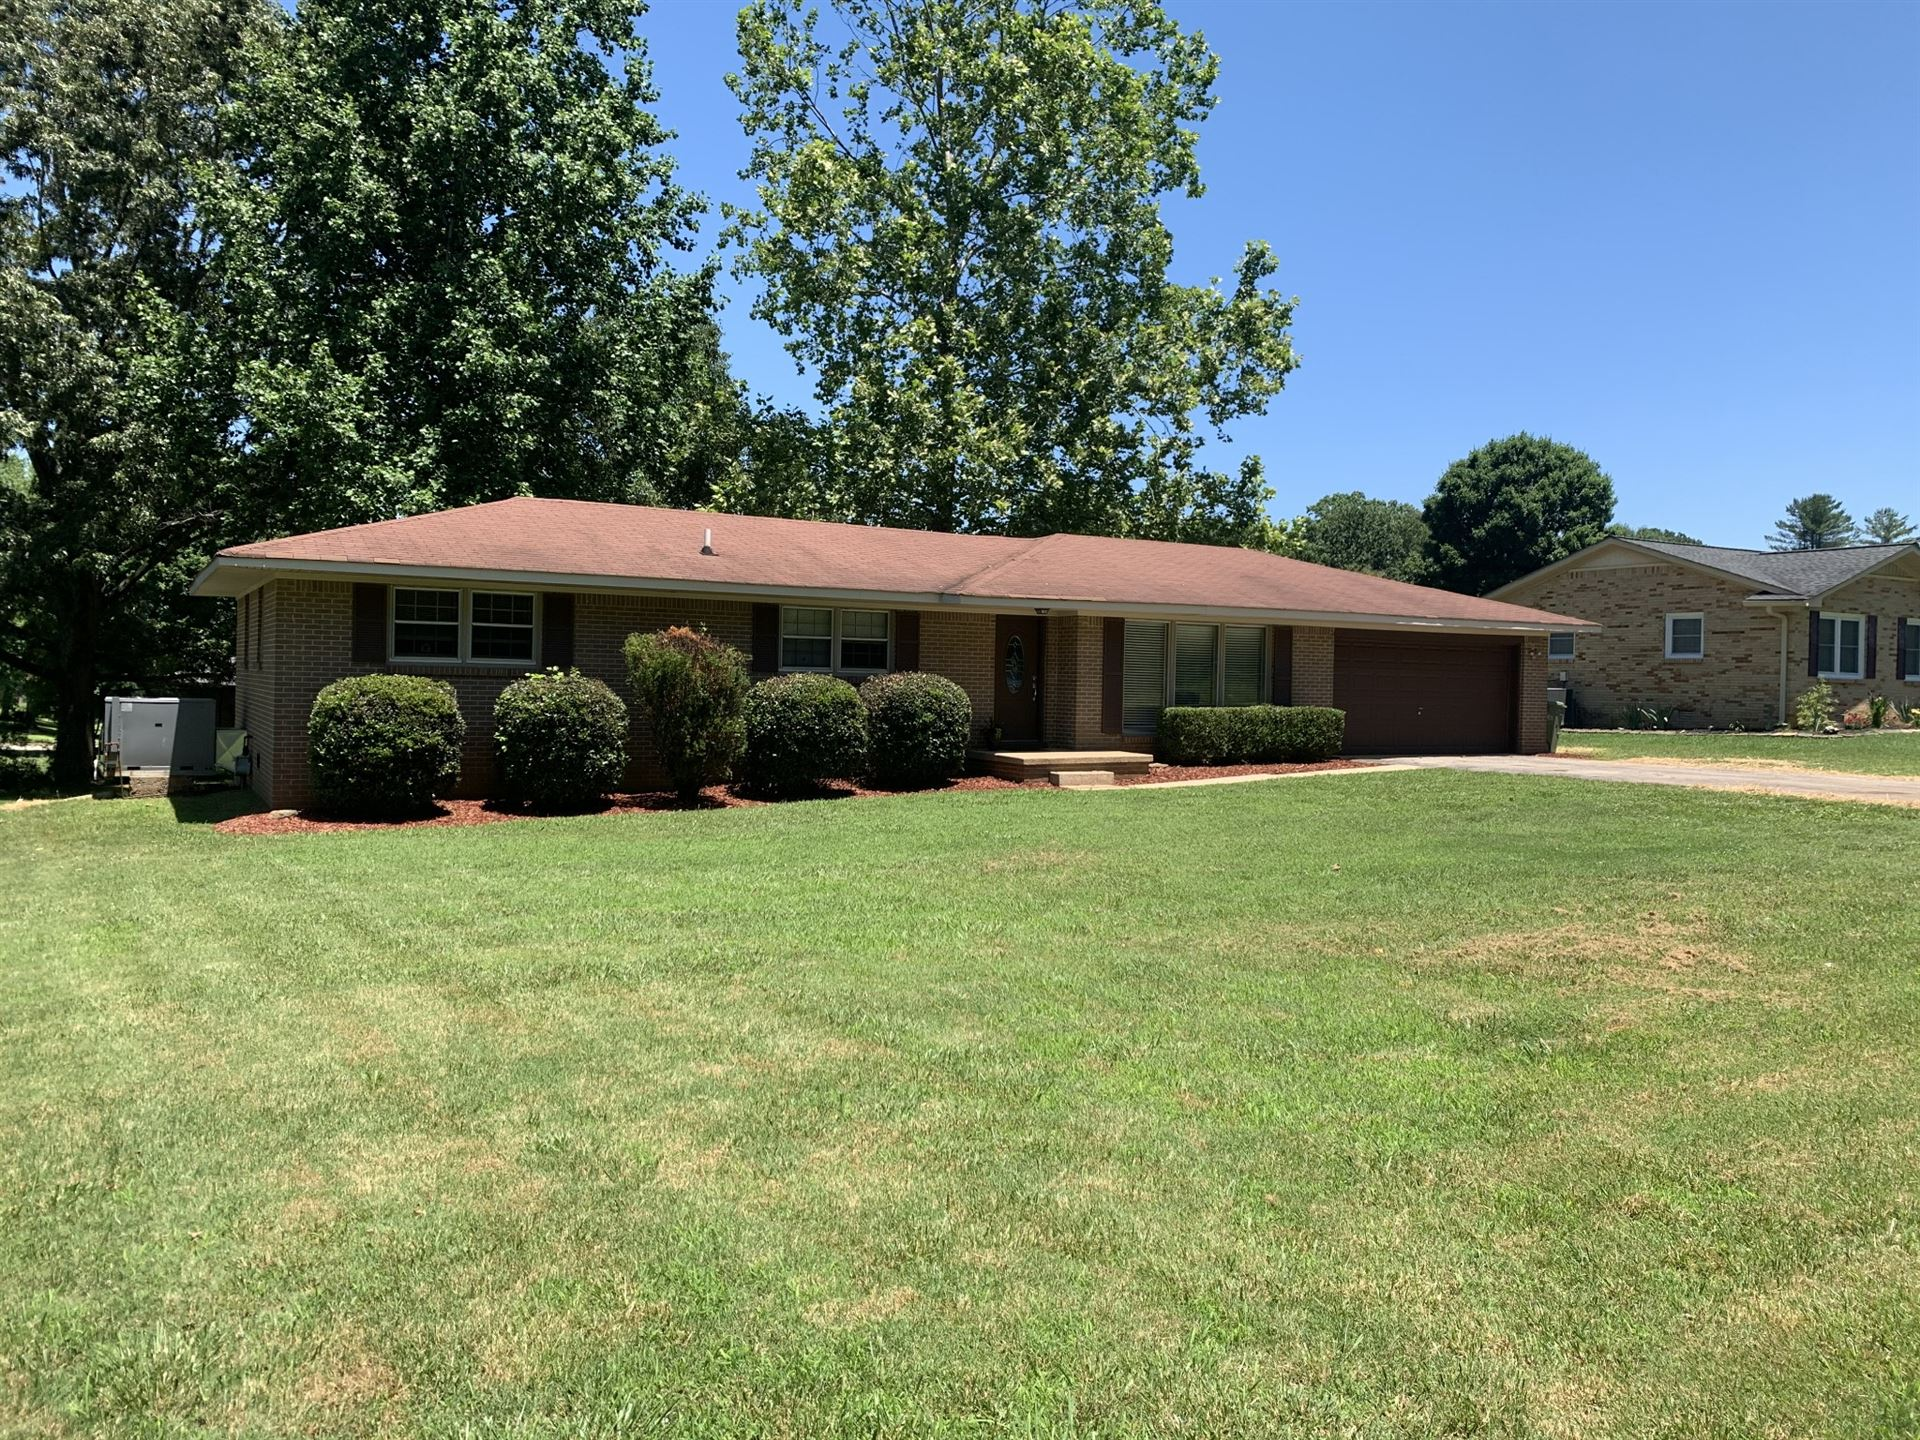 Photo of 1706 Grandaddy Rd, Lawrenceburg, TN 38464 (MLS # 2263278)